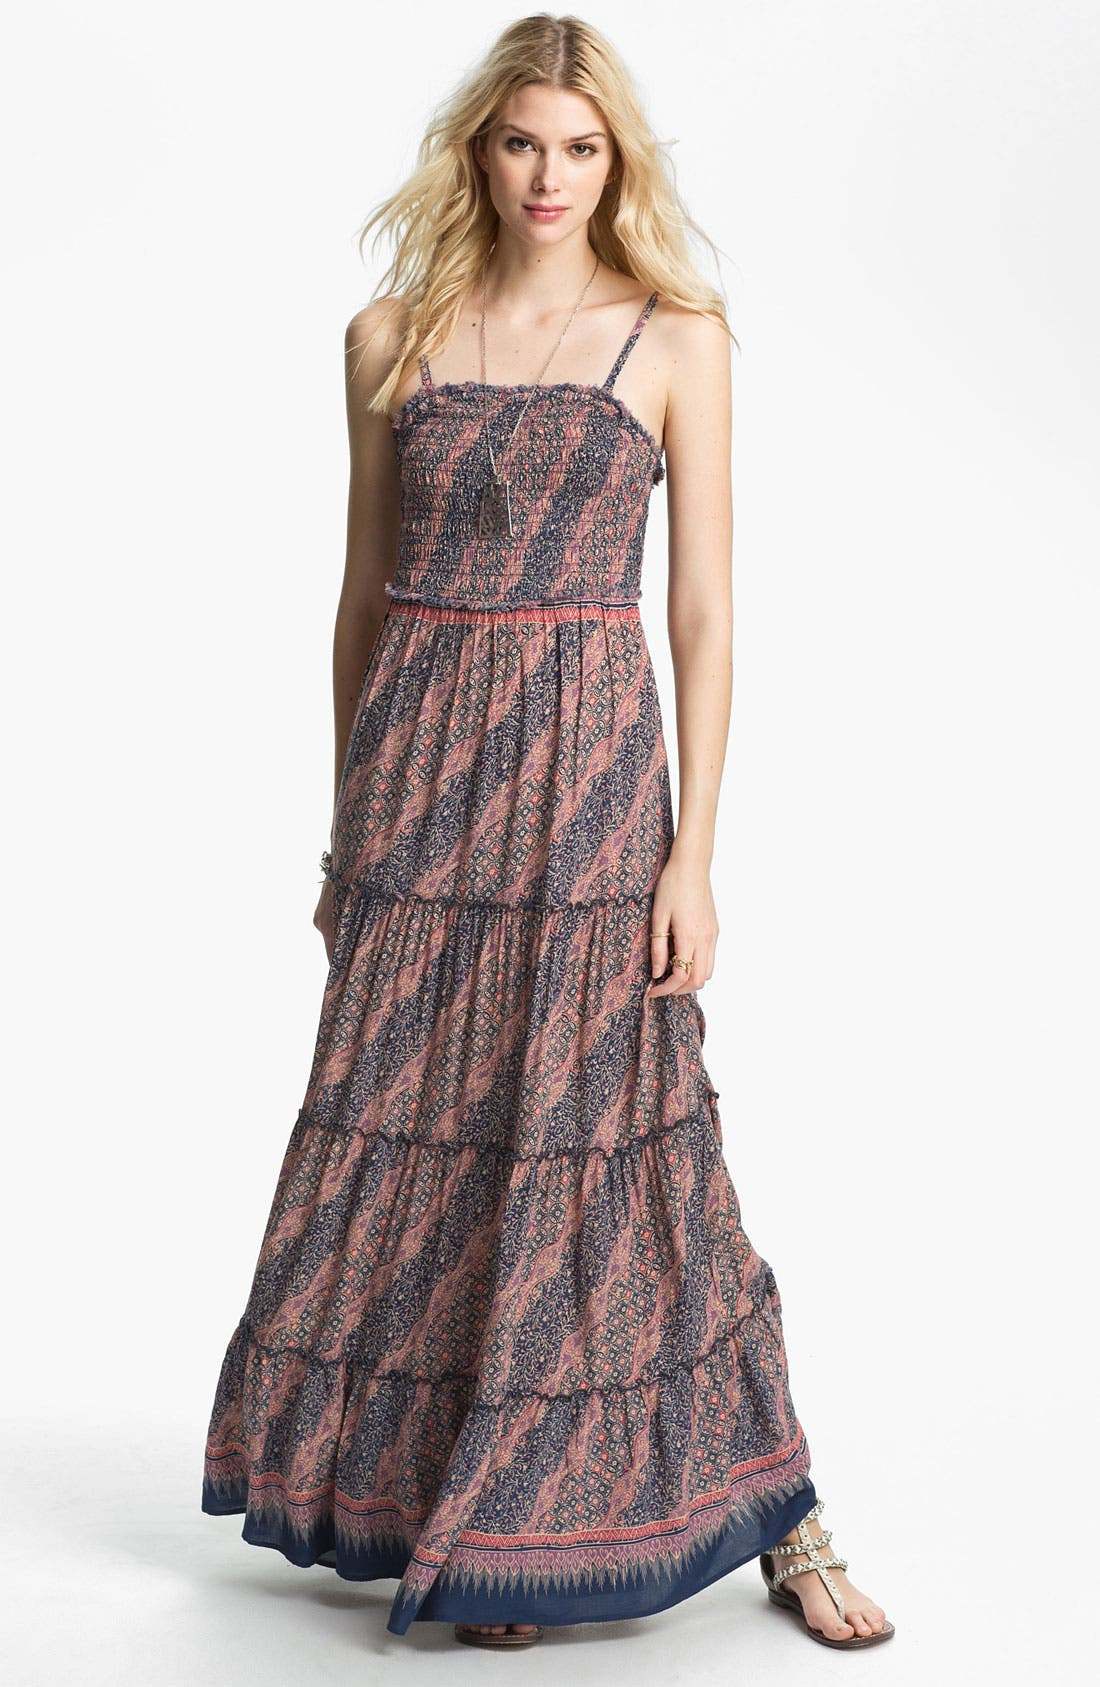 Alternate Image 1 Selected - Free People Vintage Print Tiered Maxi Dress